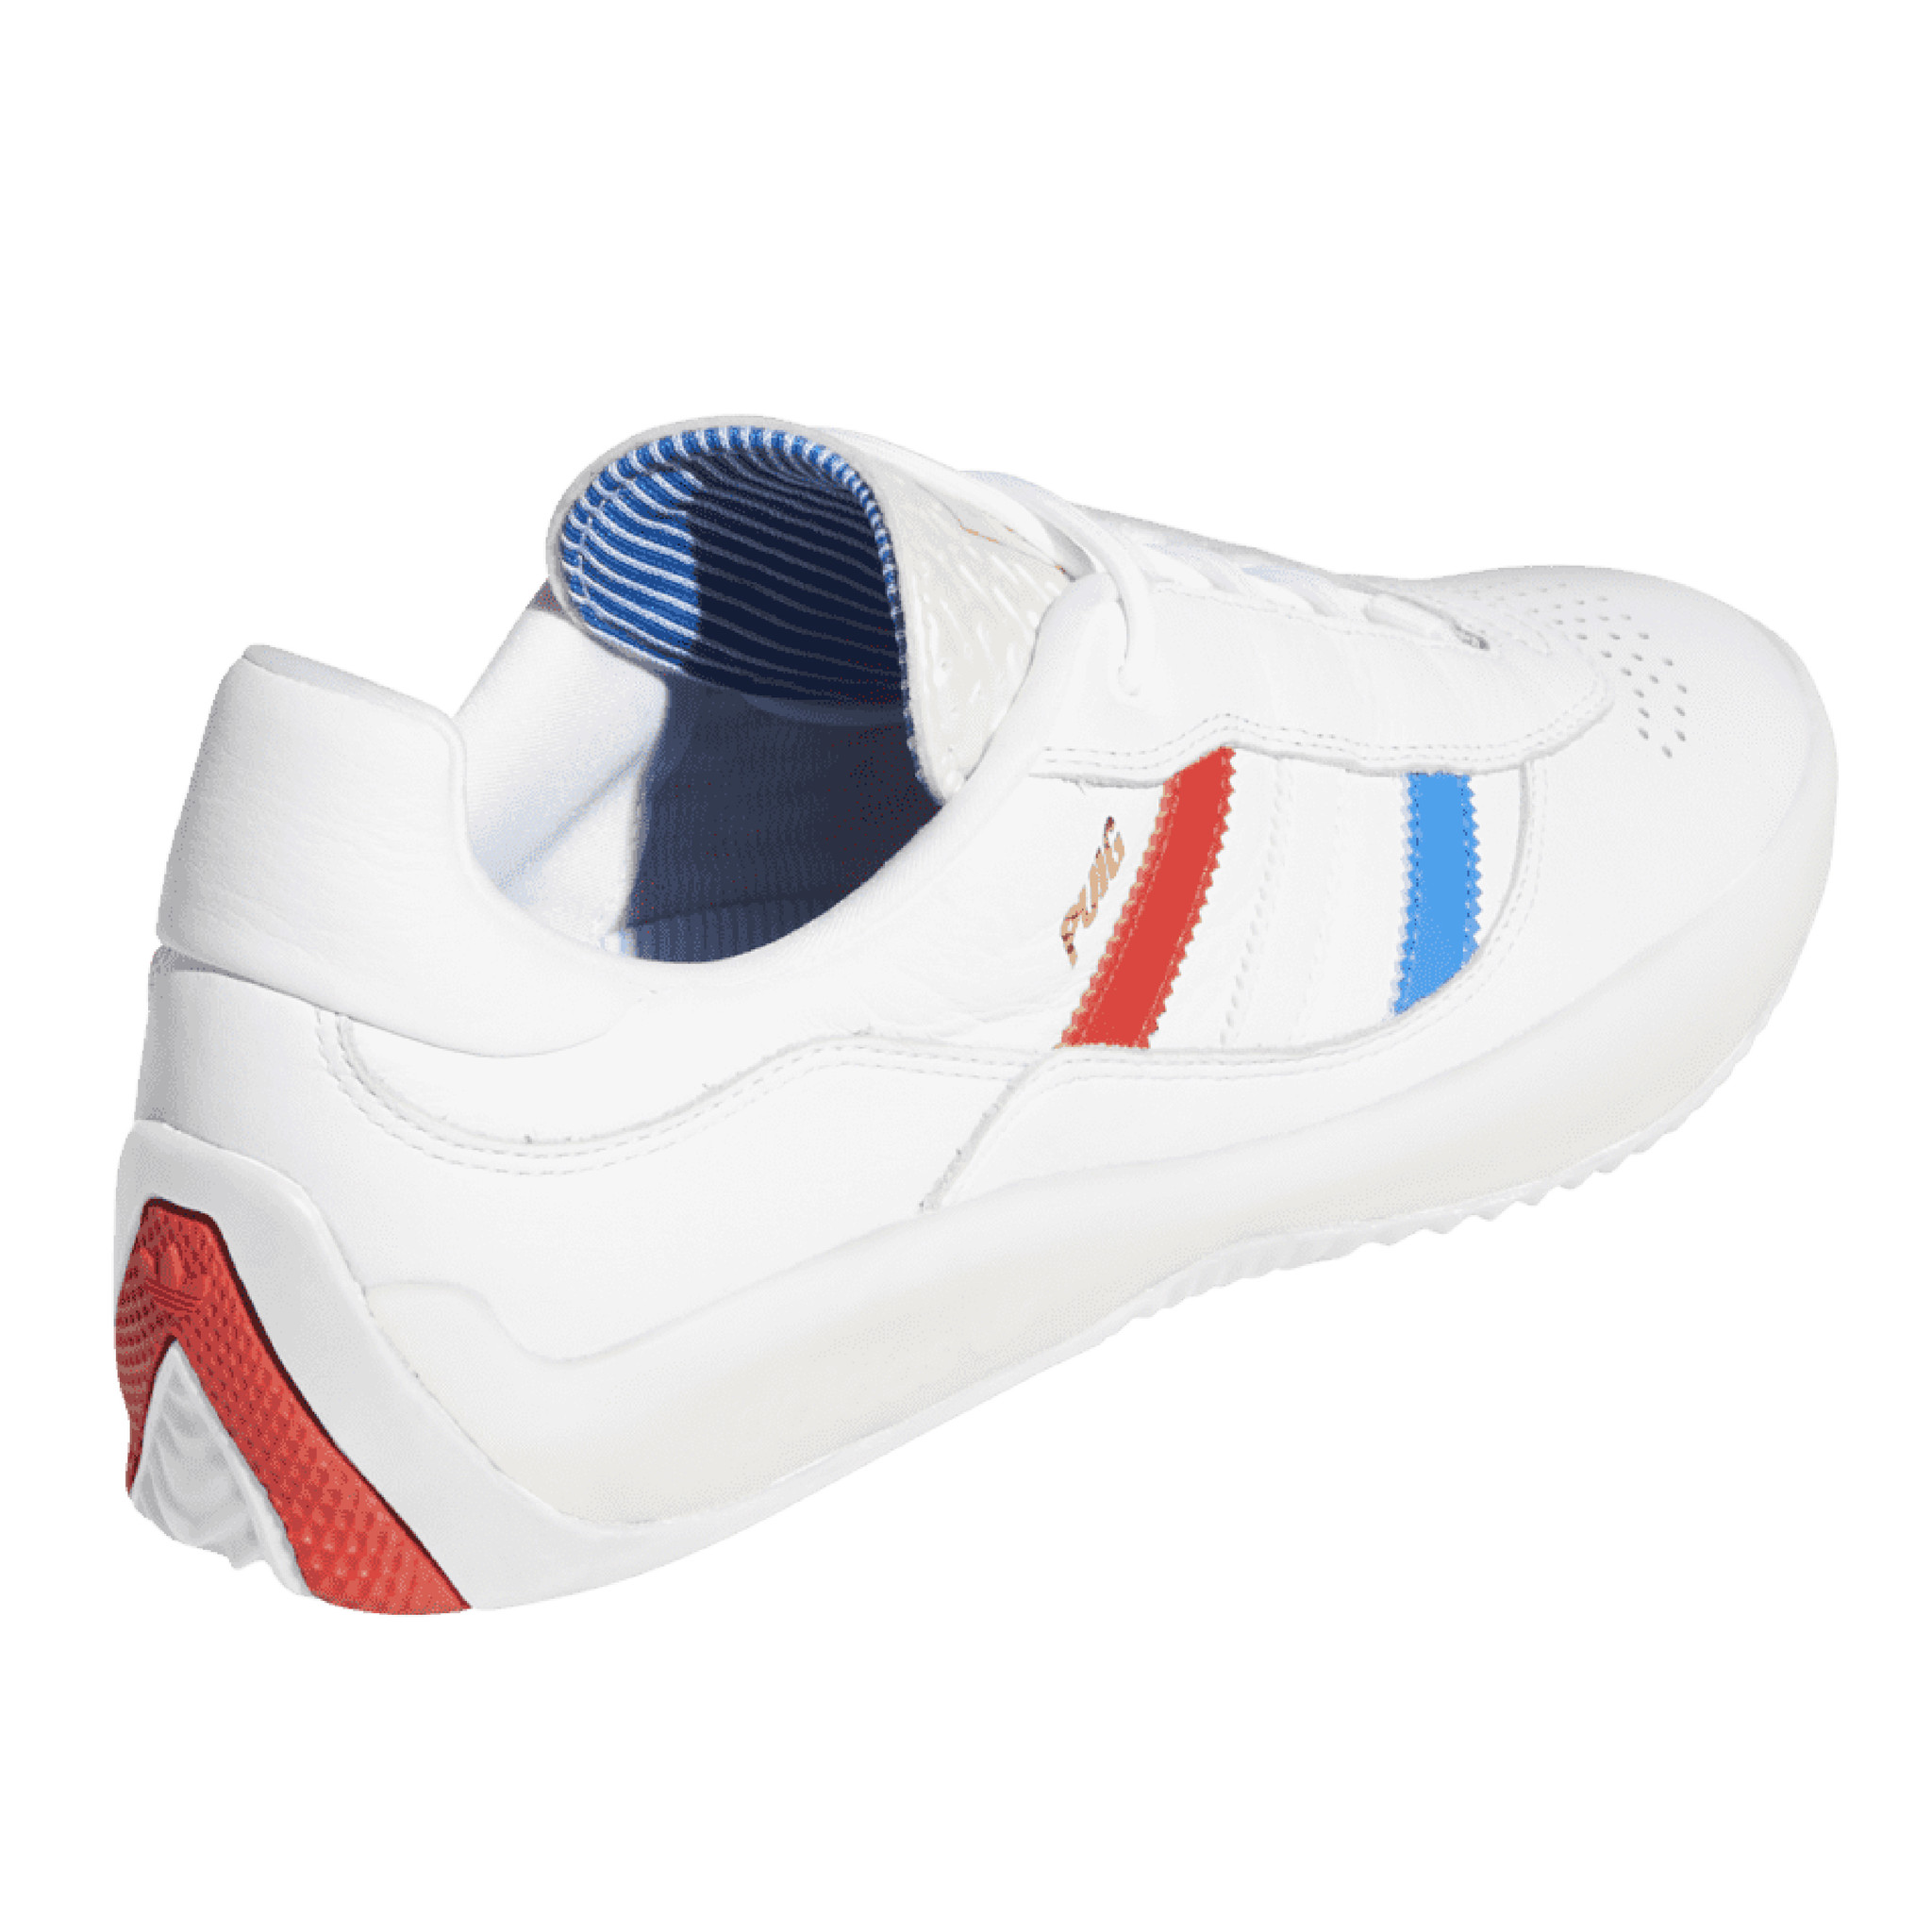 ADIDAS ADIDAS PUIG CORE WHITE / BLUE / RED